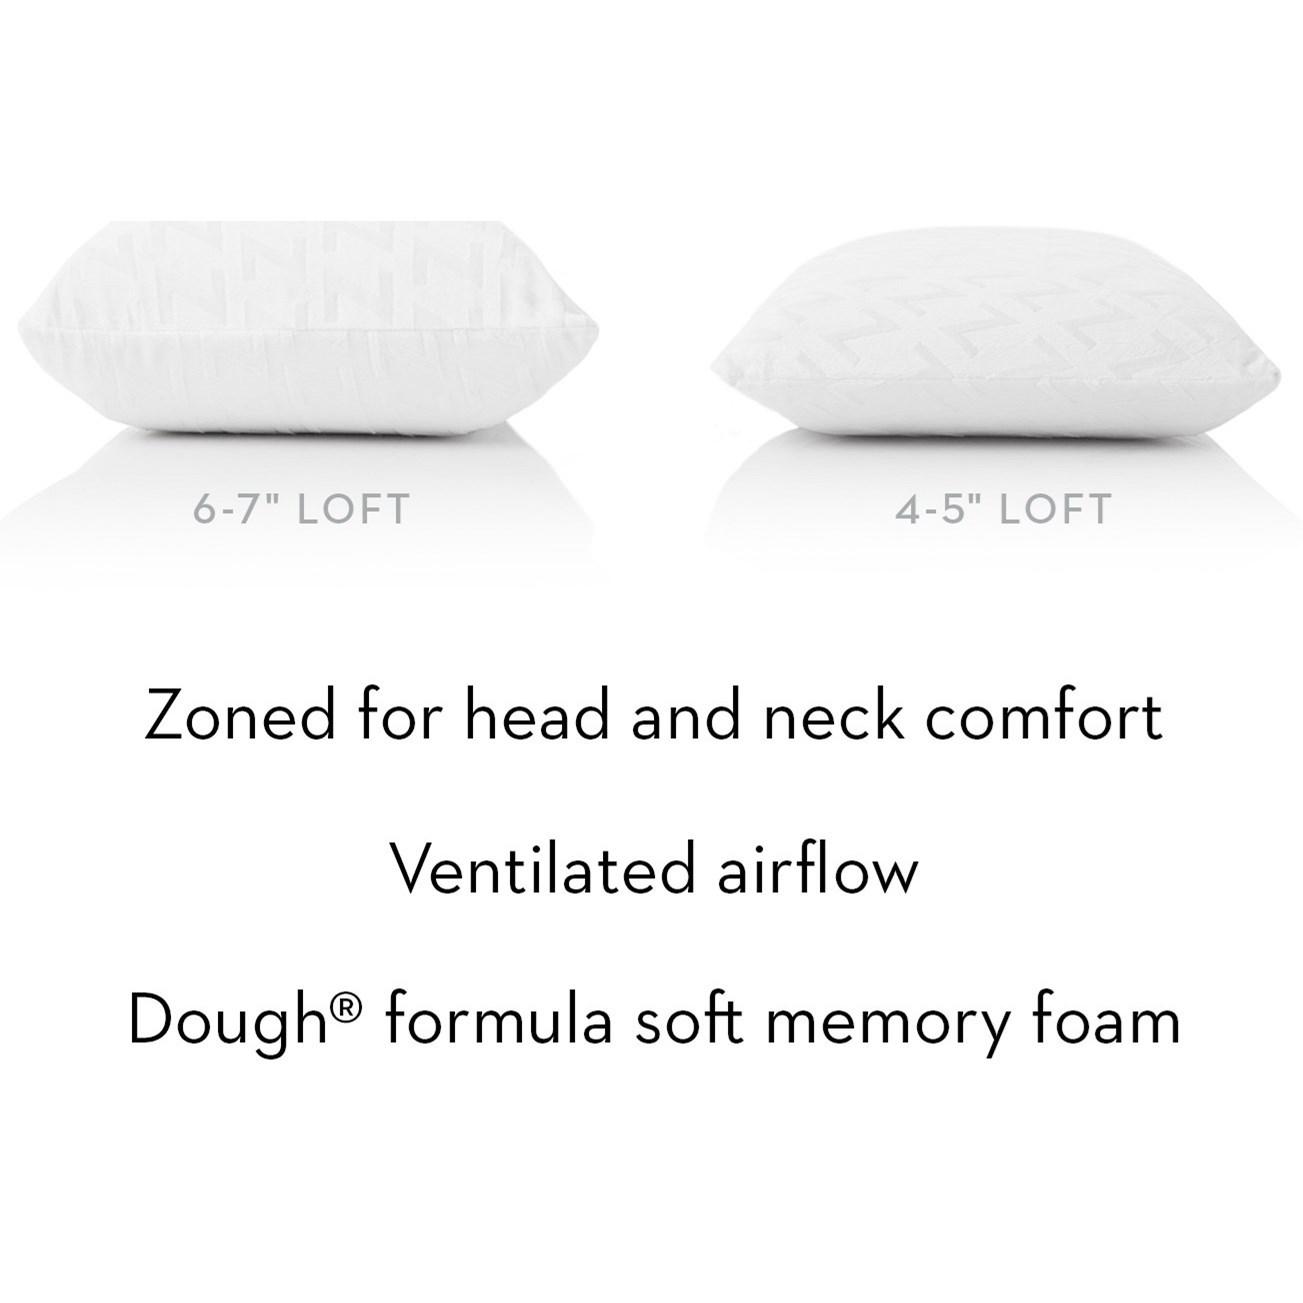 zoned dough king zoned dough mid loft plush pillow